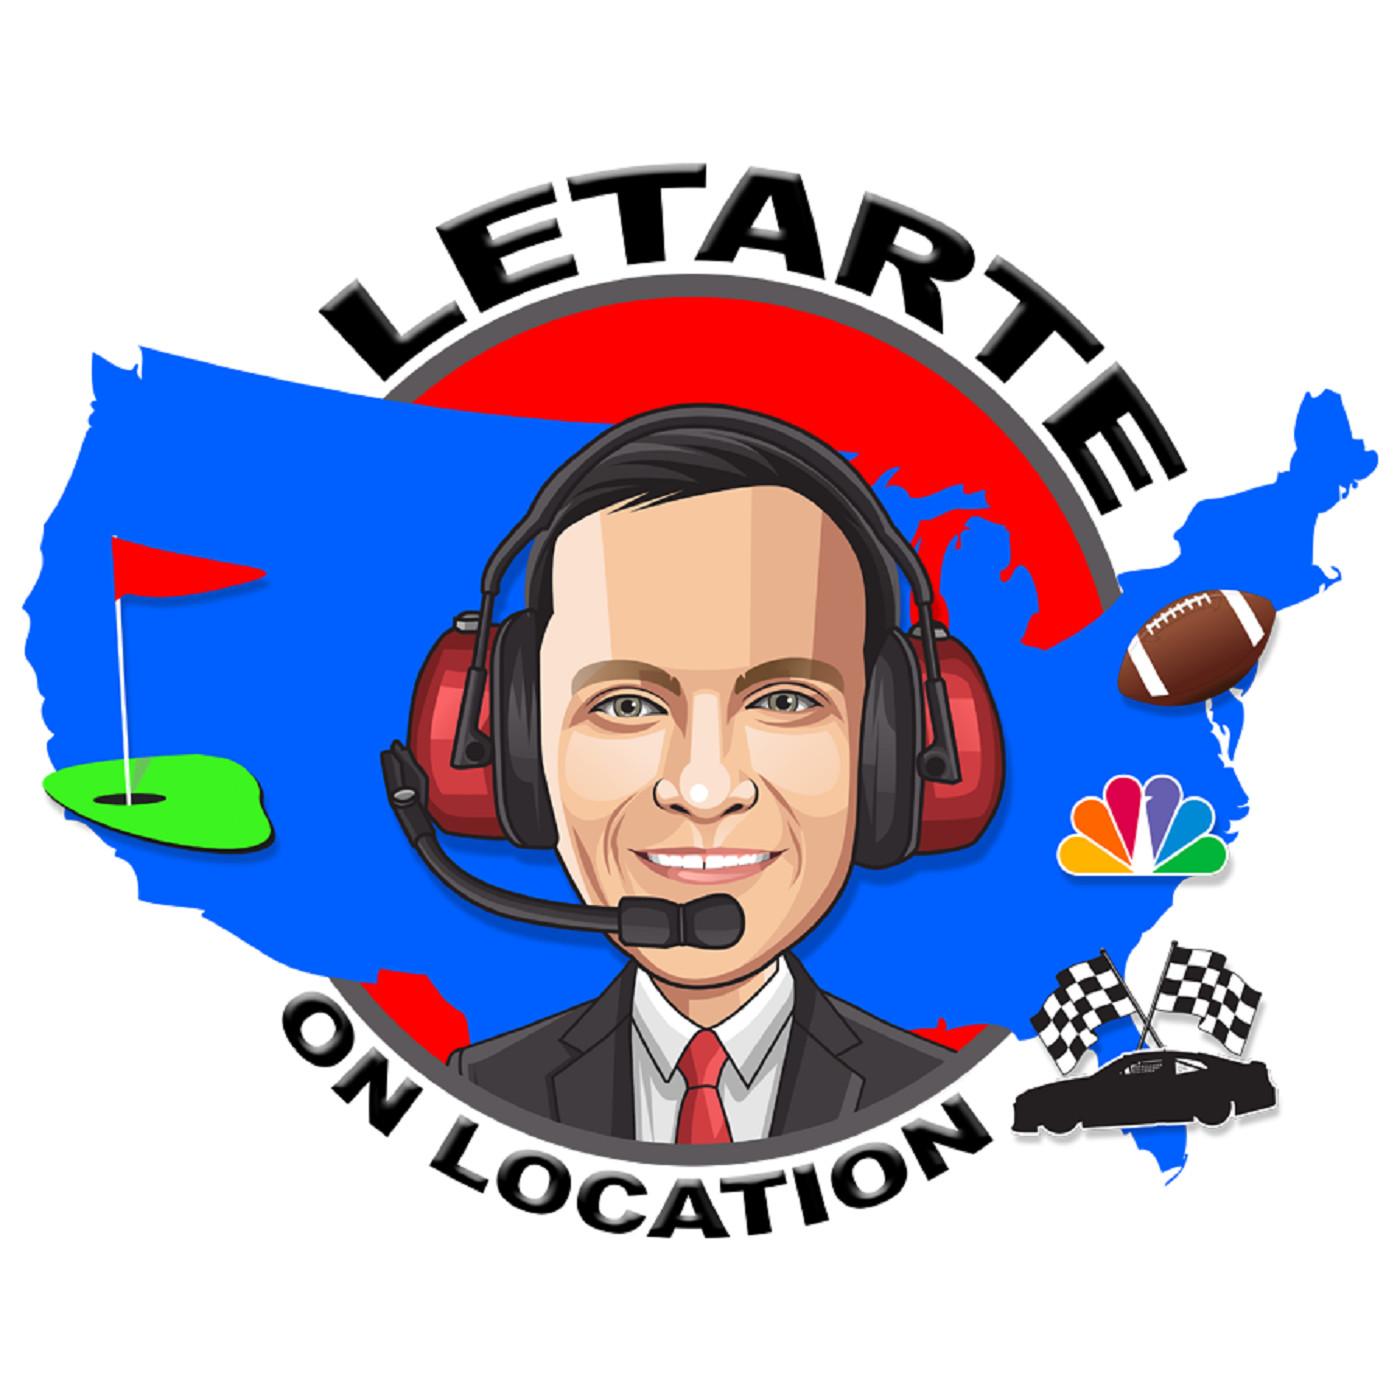 Letarte on Location